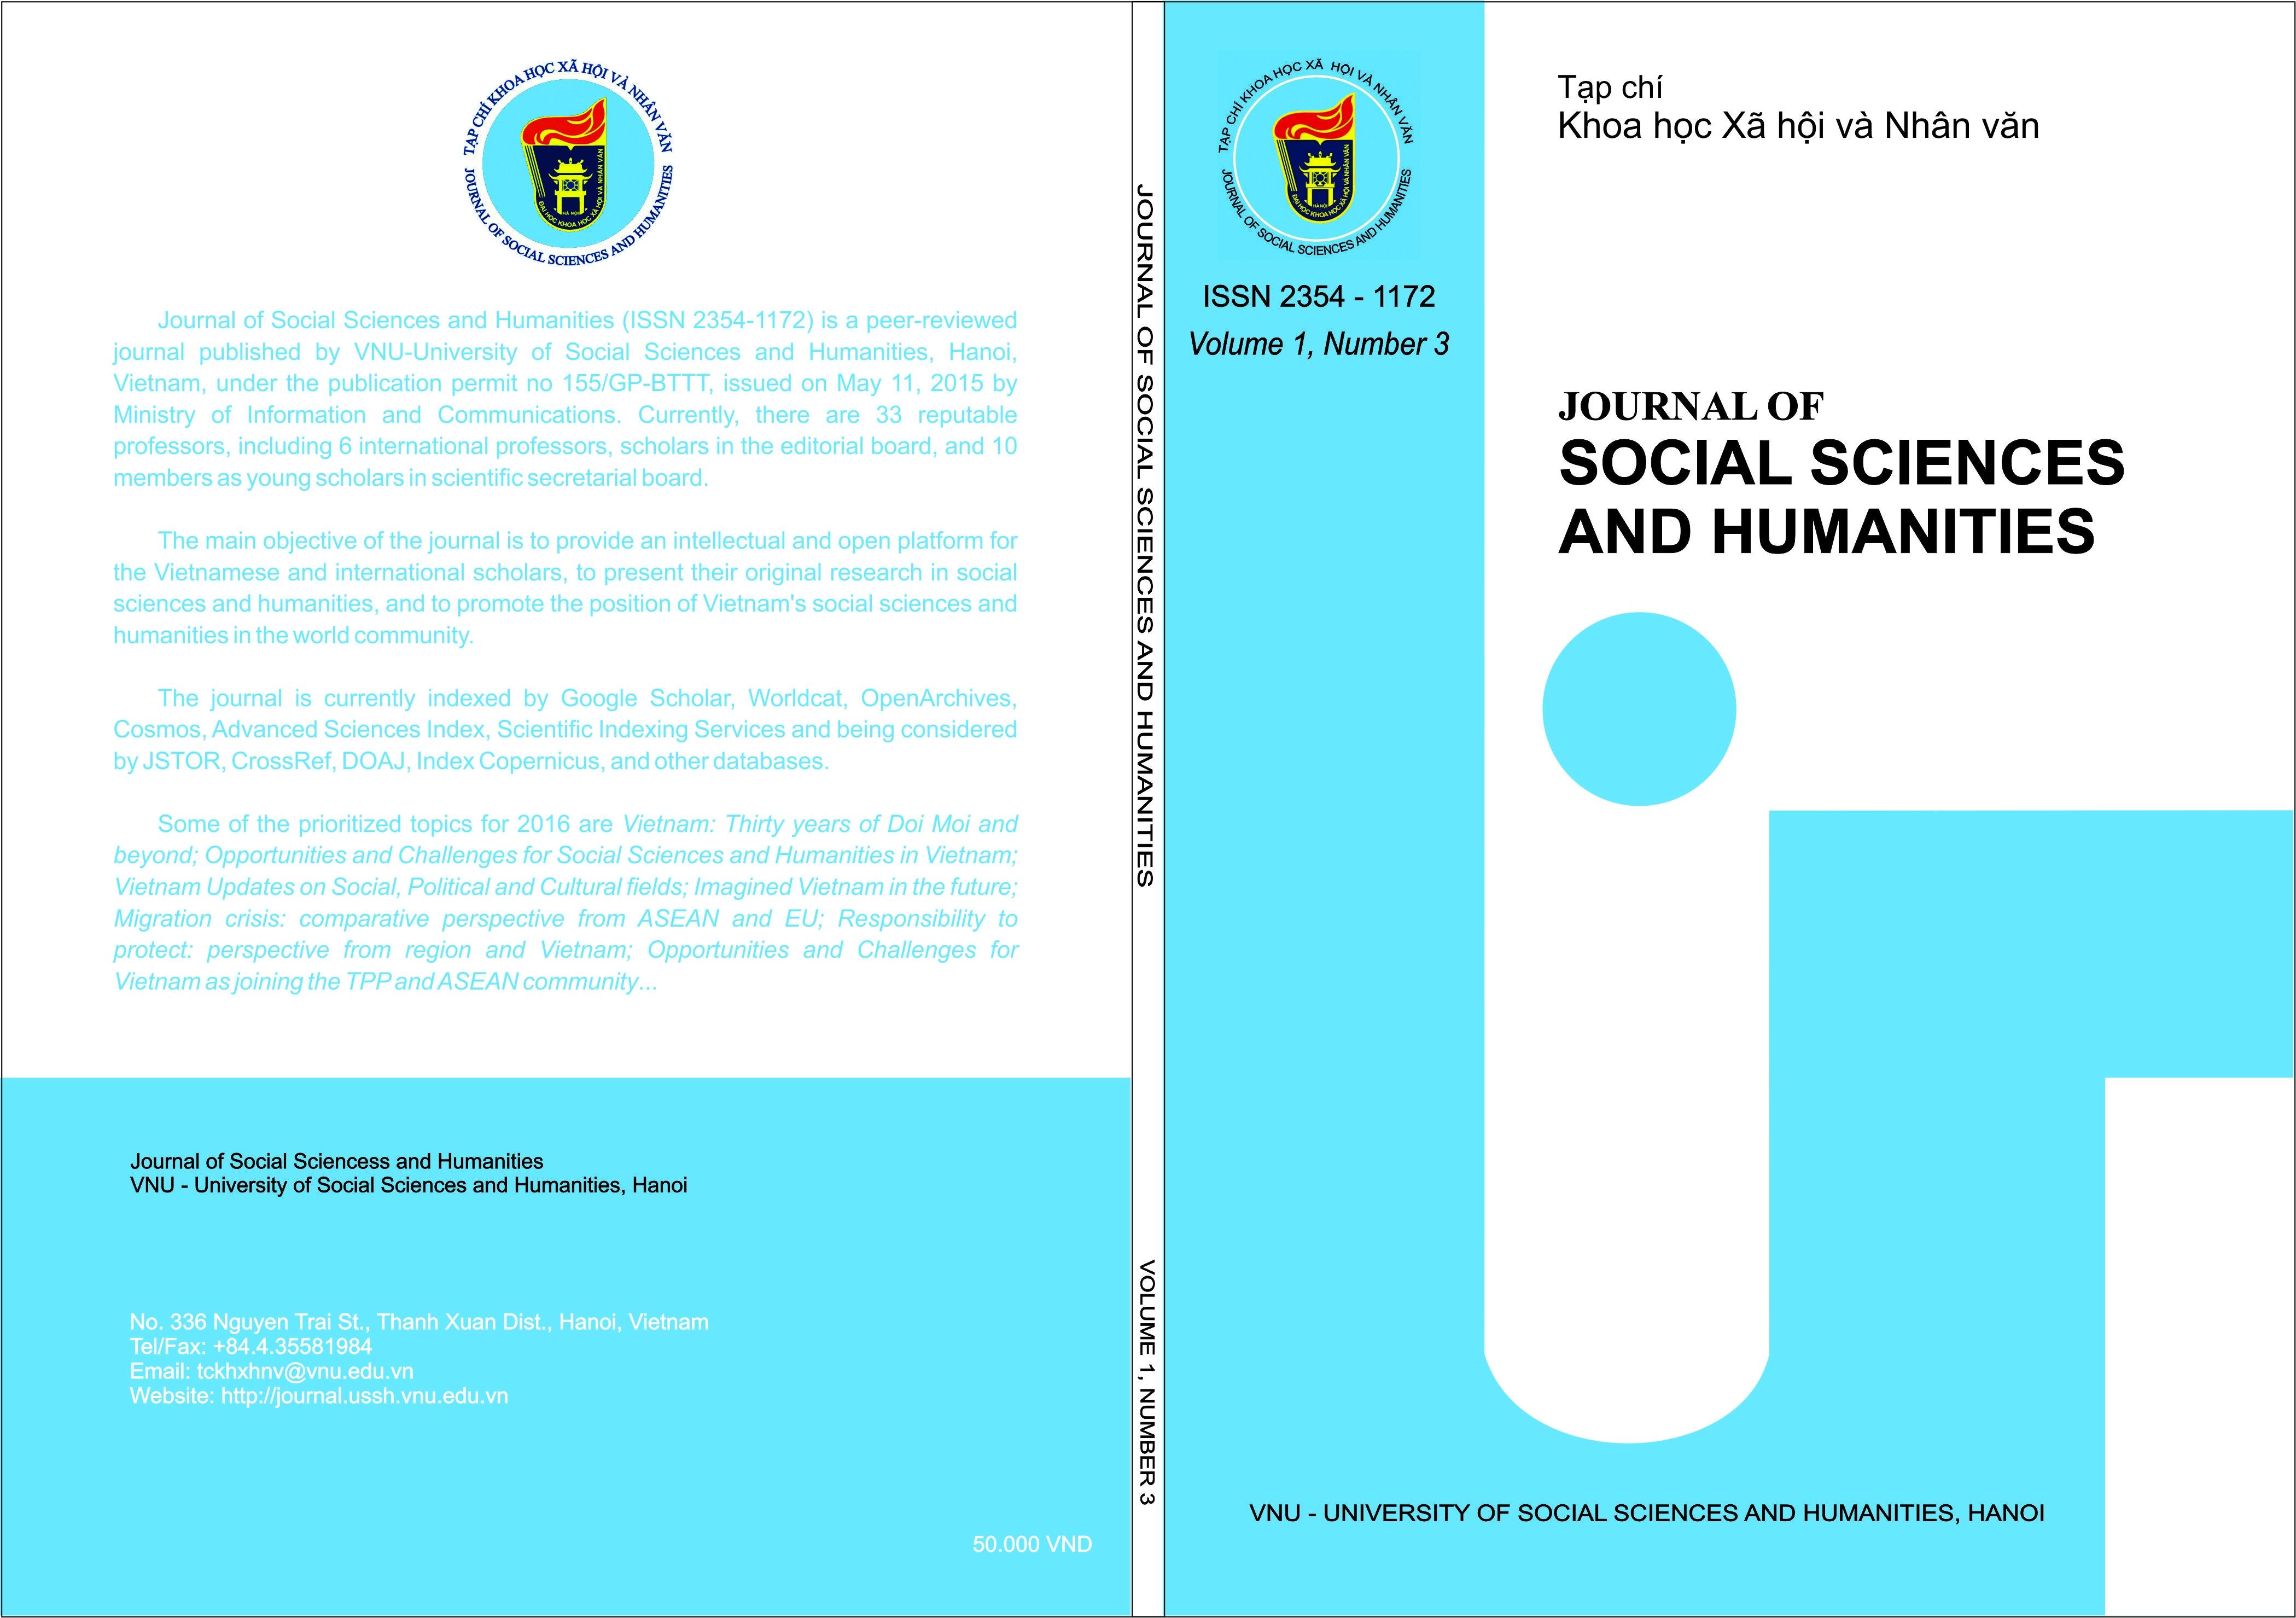 Journal: Vietnam Journal of Social Sciences and Humanities